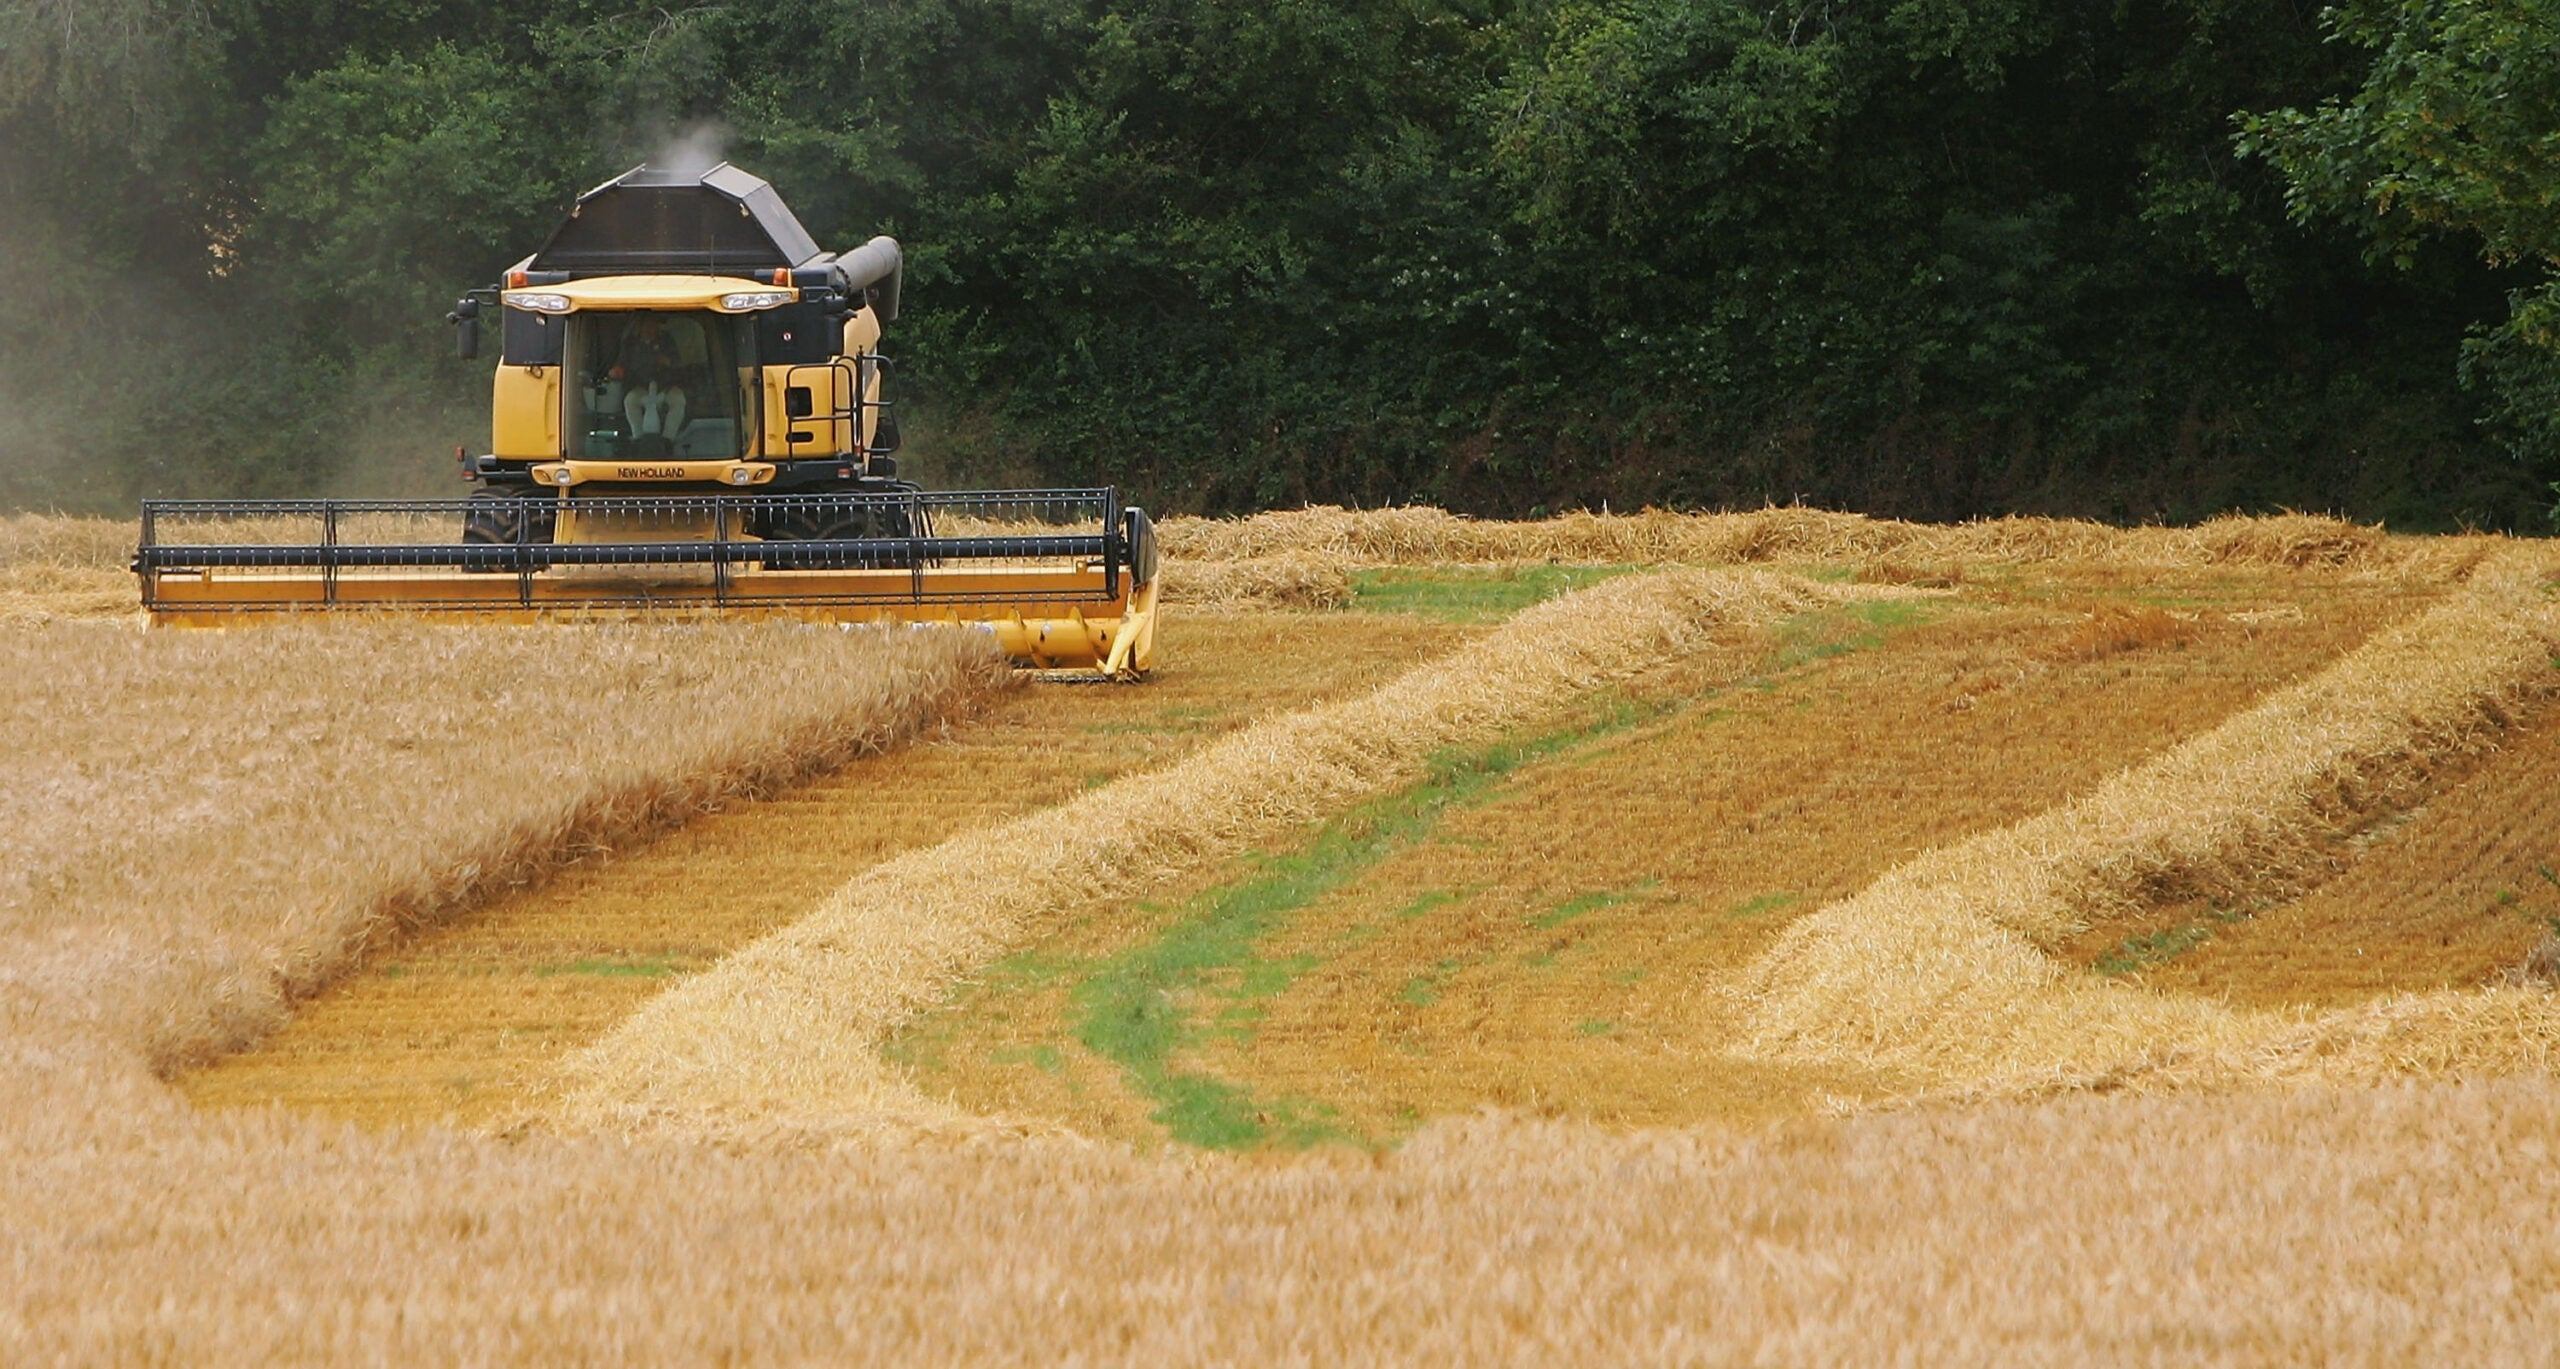 Liz Truss's trade deals will destroy British farming as we know it